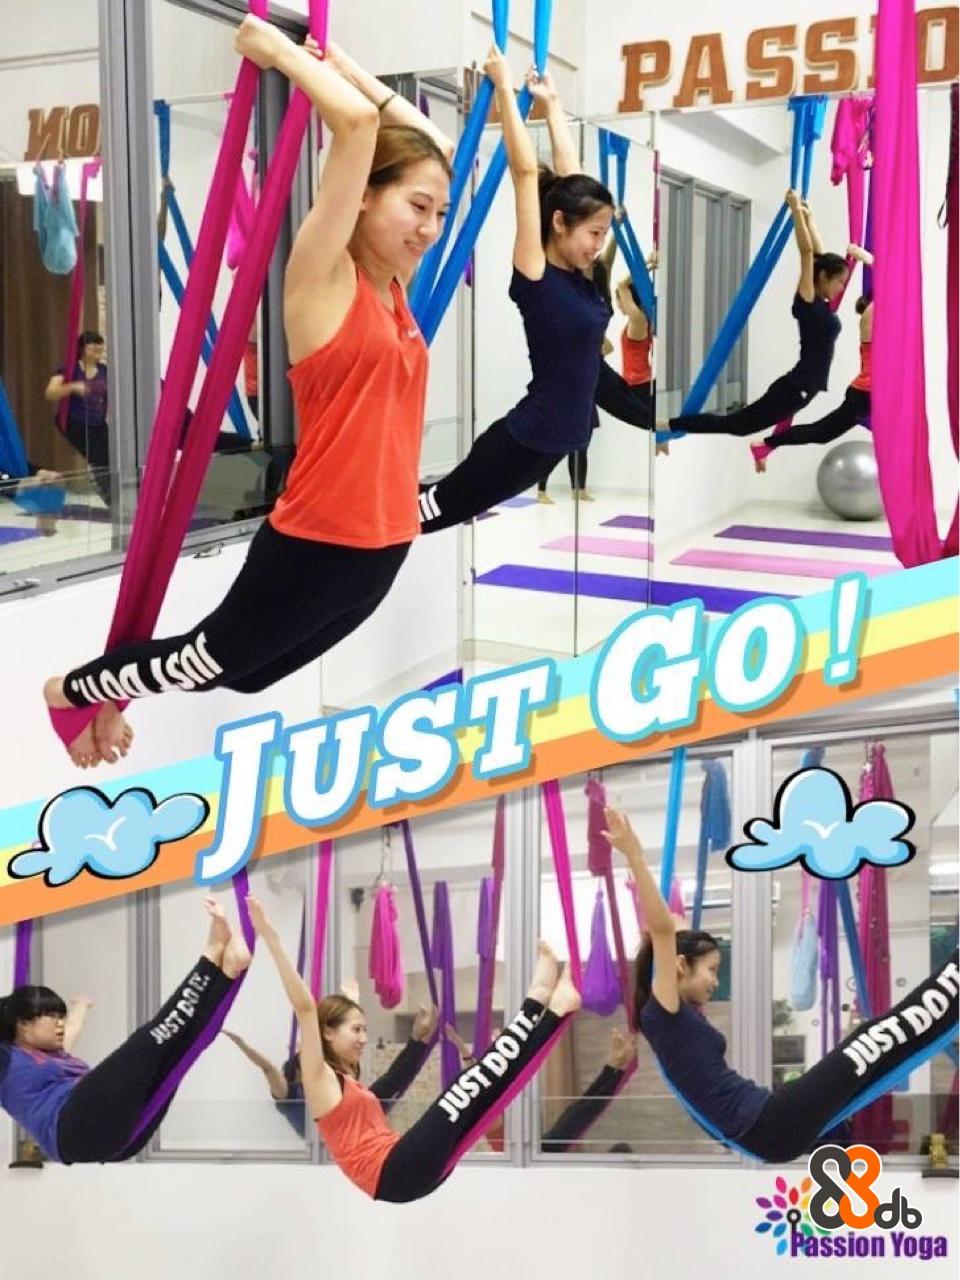 PASS MO Passion Yoga  Physical fitness,Pilates,Leg,Dance,Room